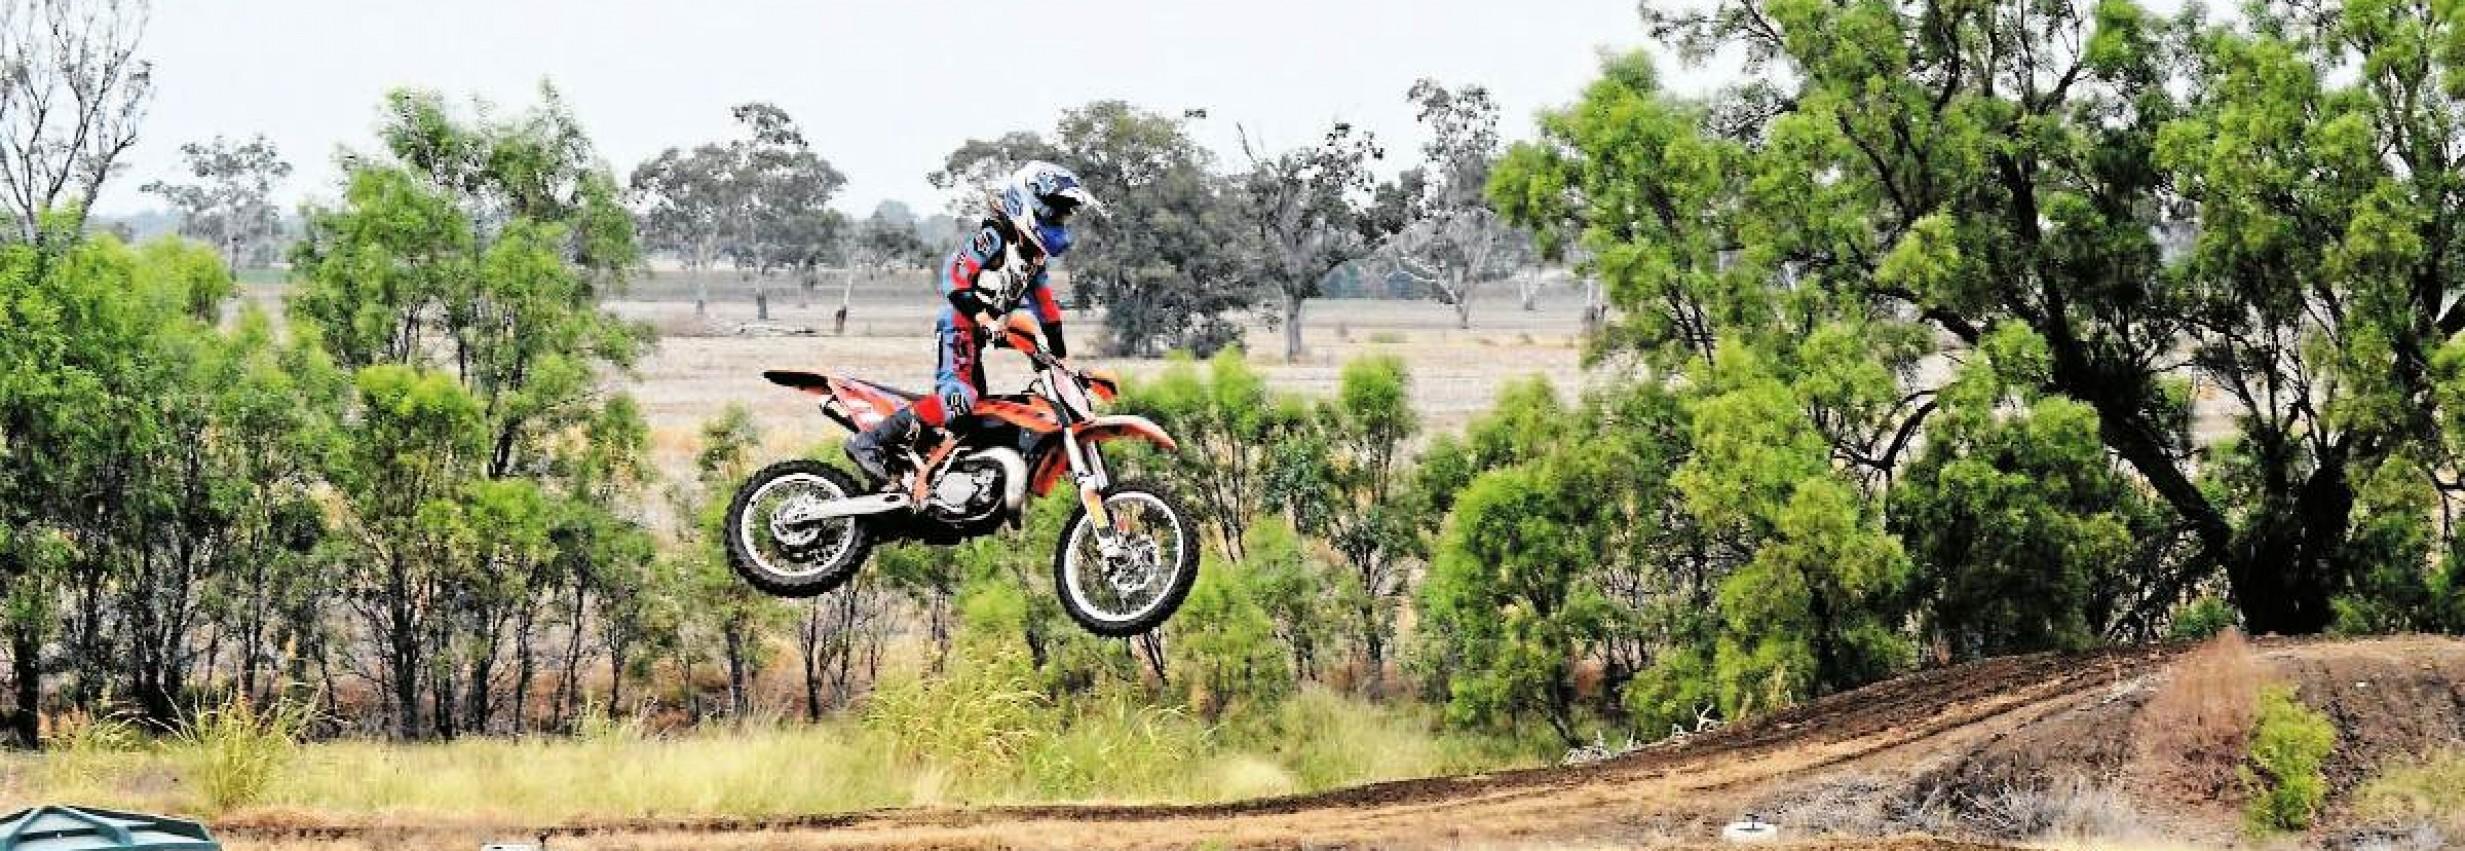 Boolooroo Raceway – Moree Motorcycle Club